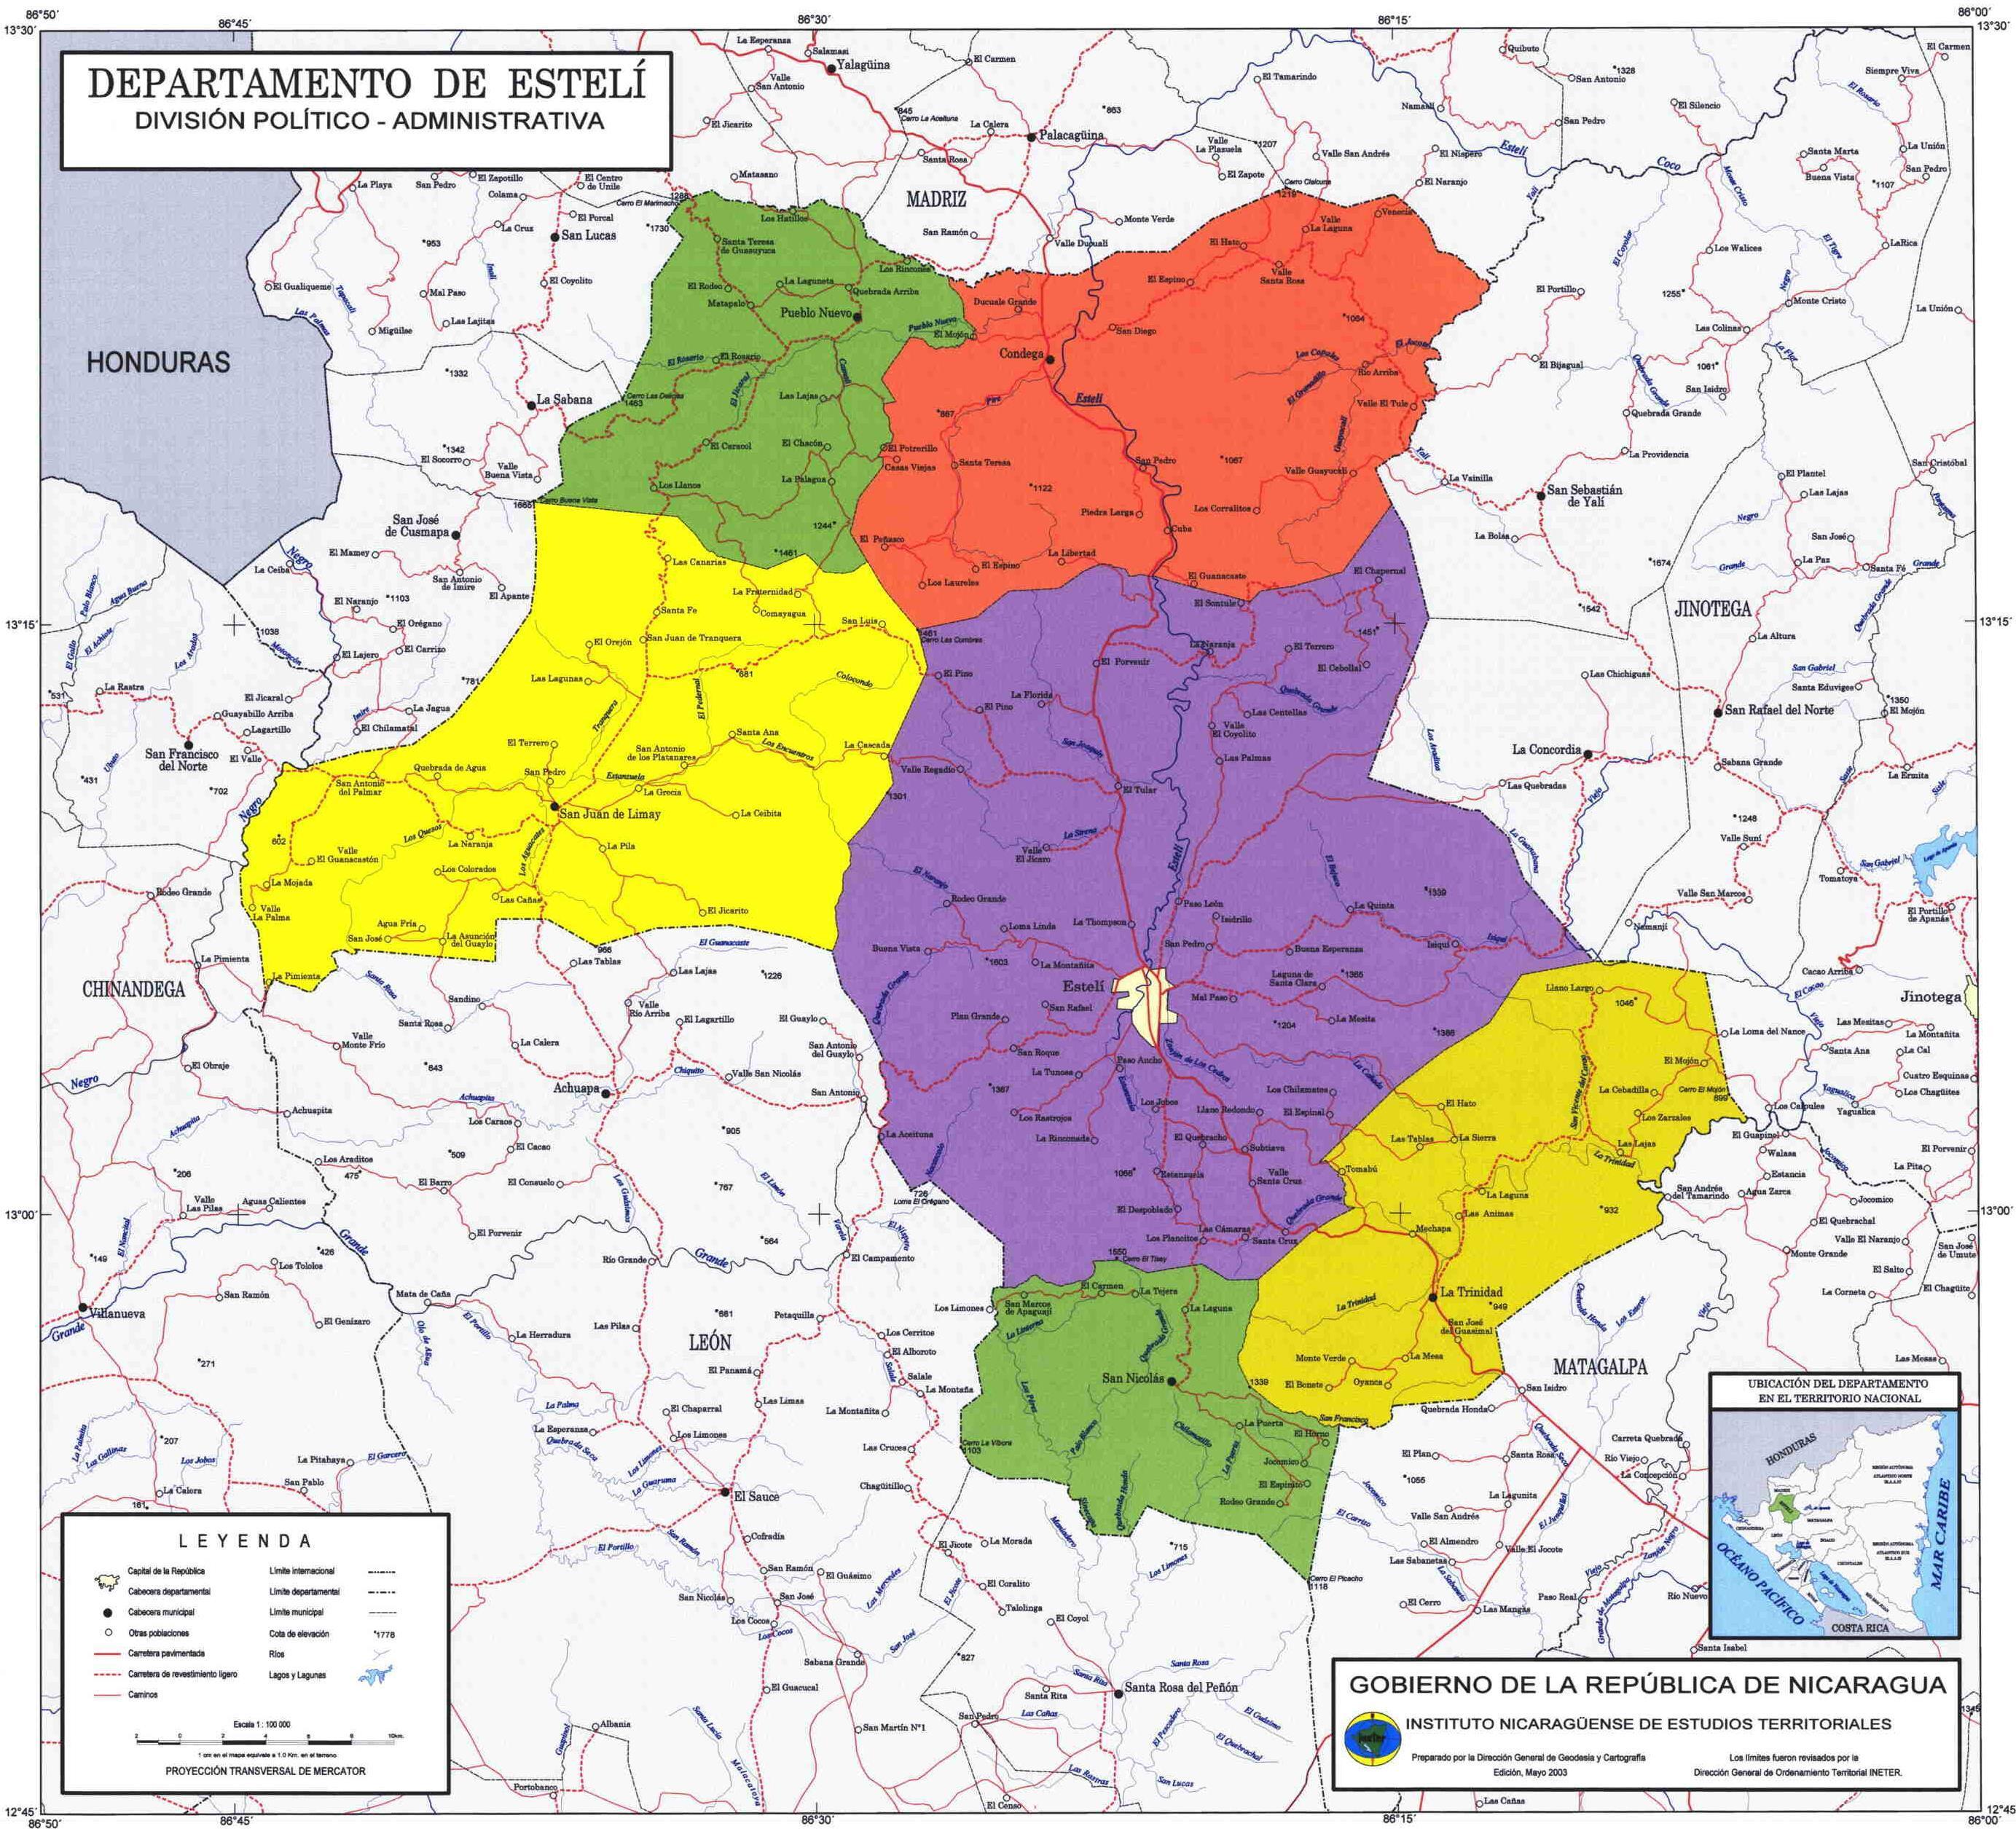 Esteli Department Administrative Political Map, Nicaragua